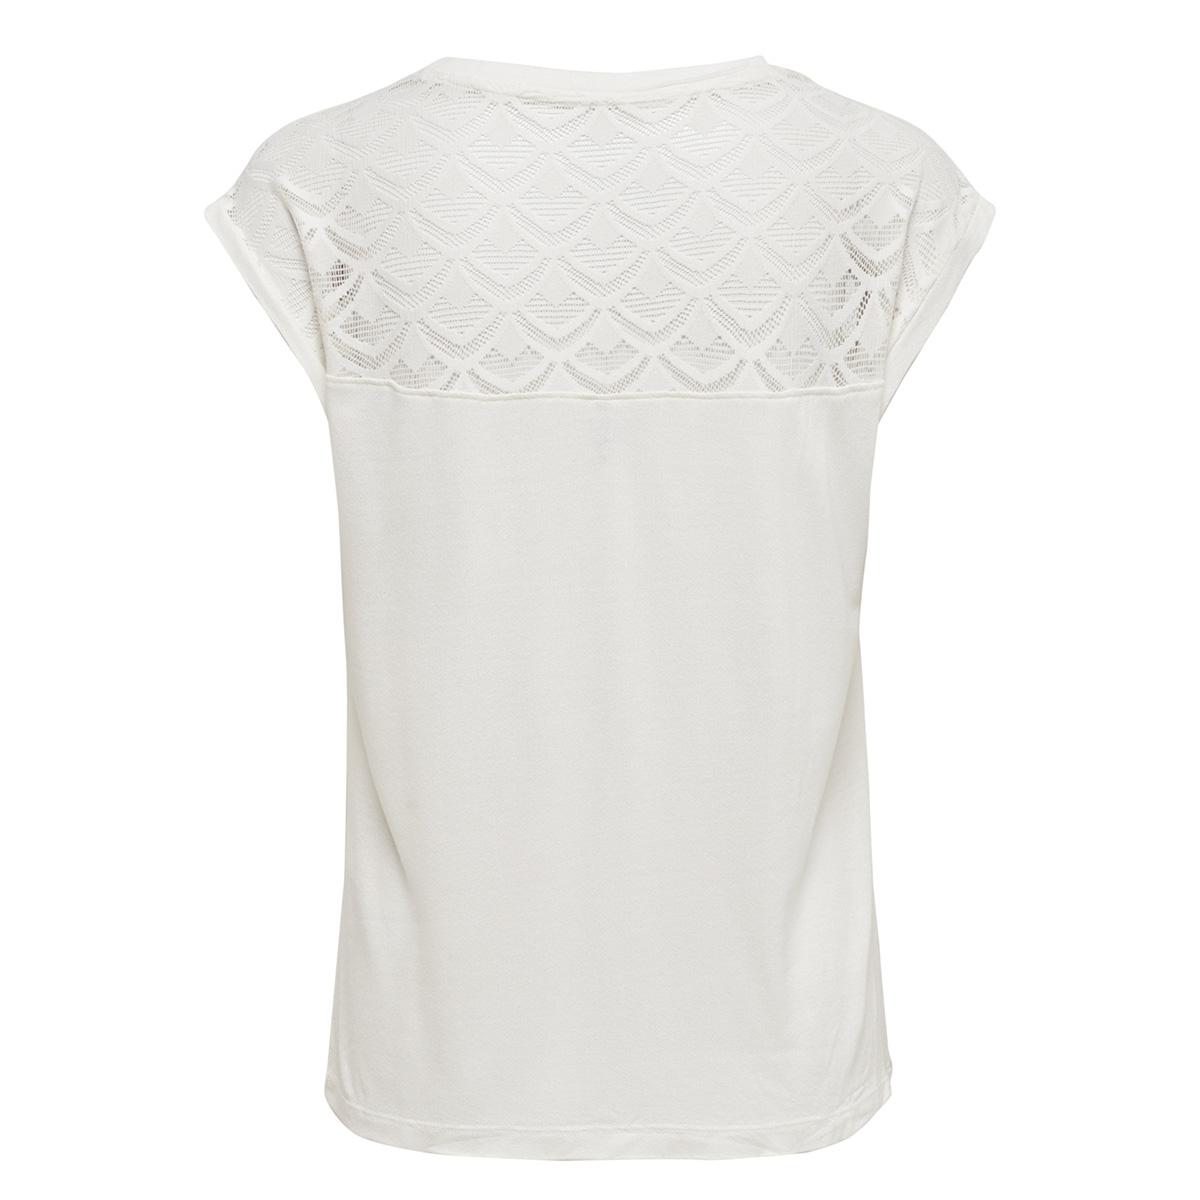 onlnicole s/s mix top noos 15151008 only t-shirt cloud dancer